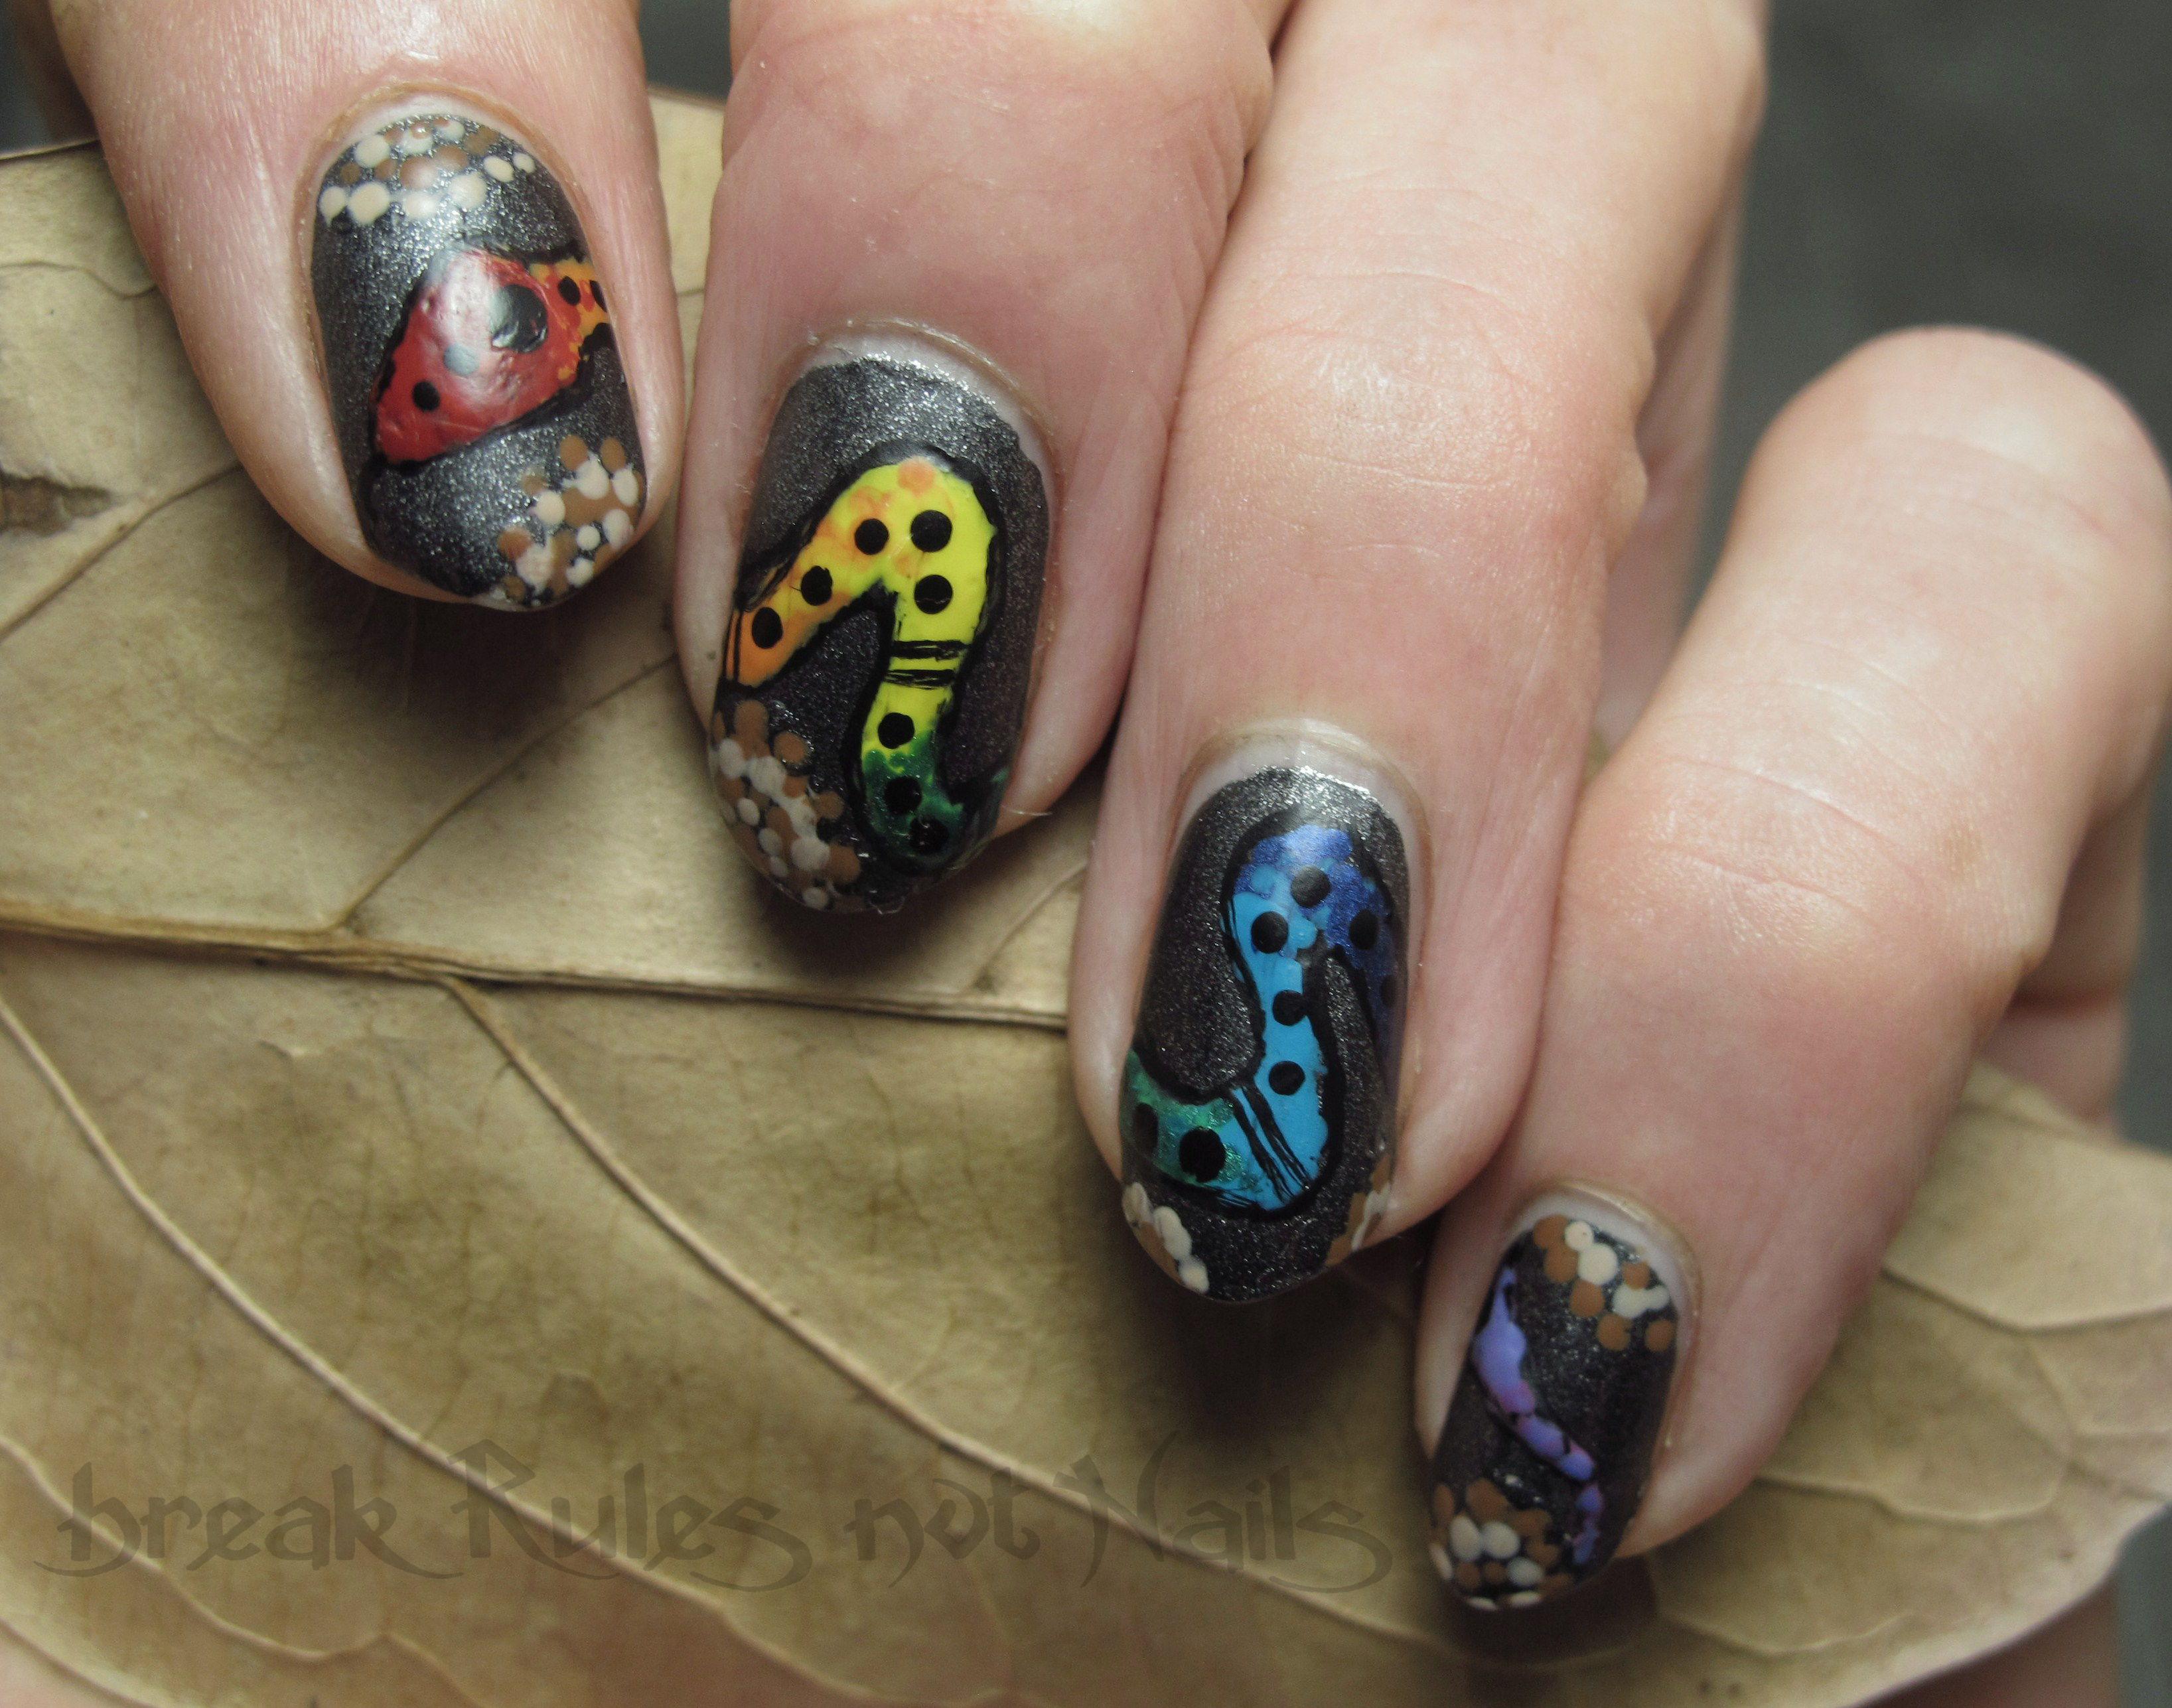 rainbow serpent nail art | Break rules, not nails